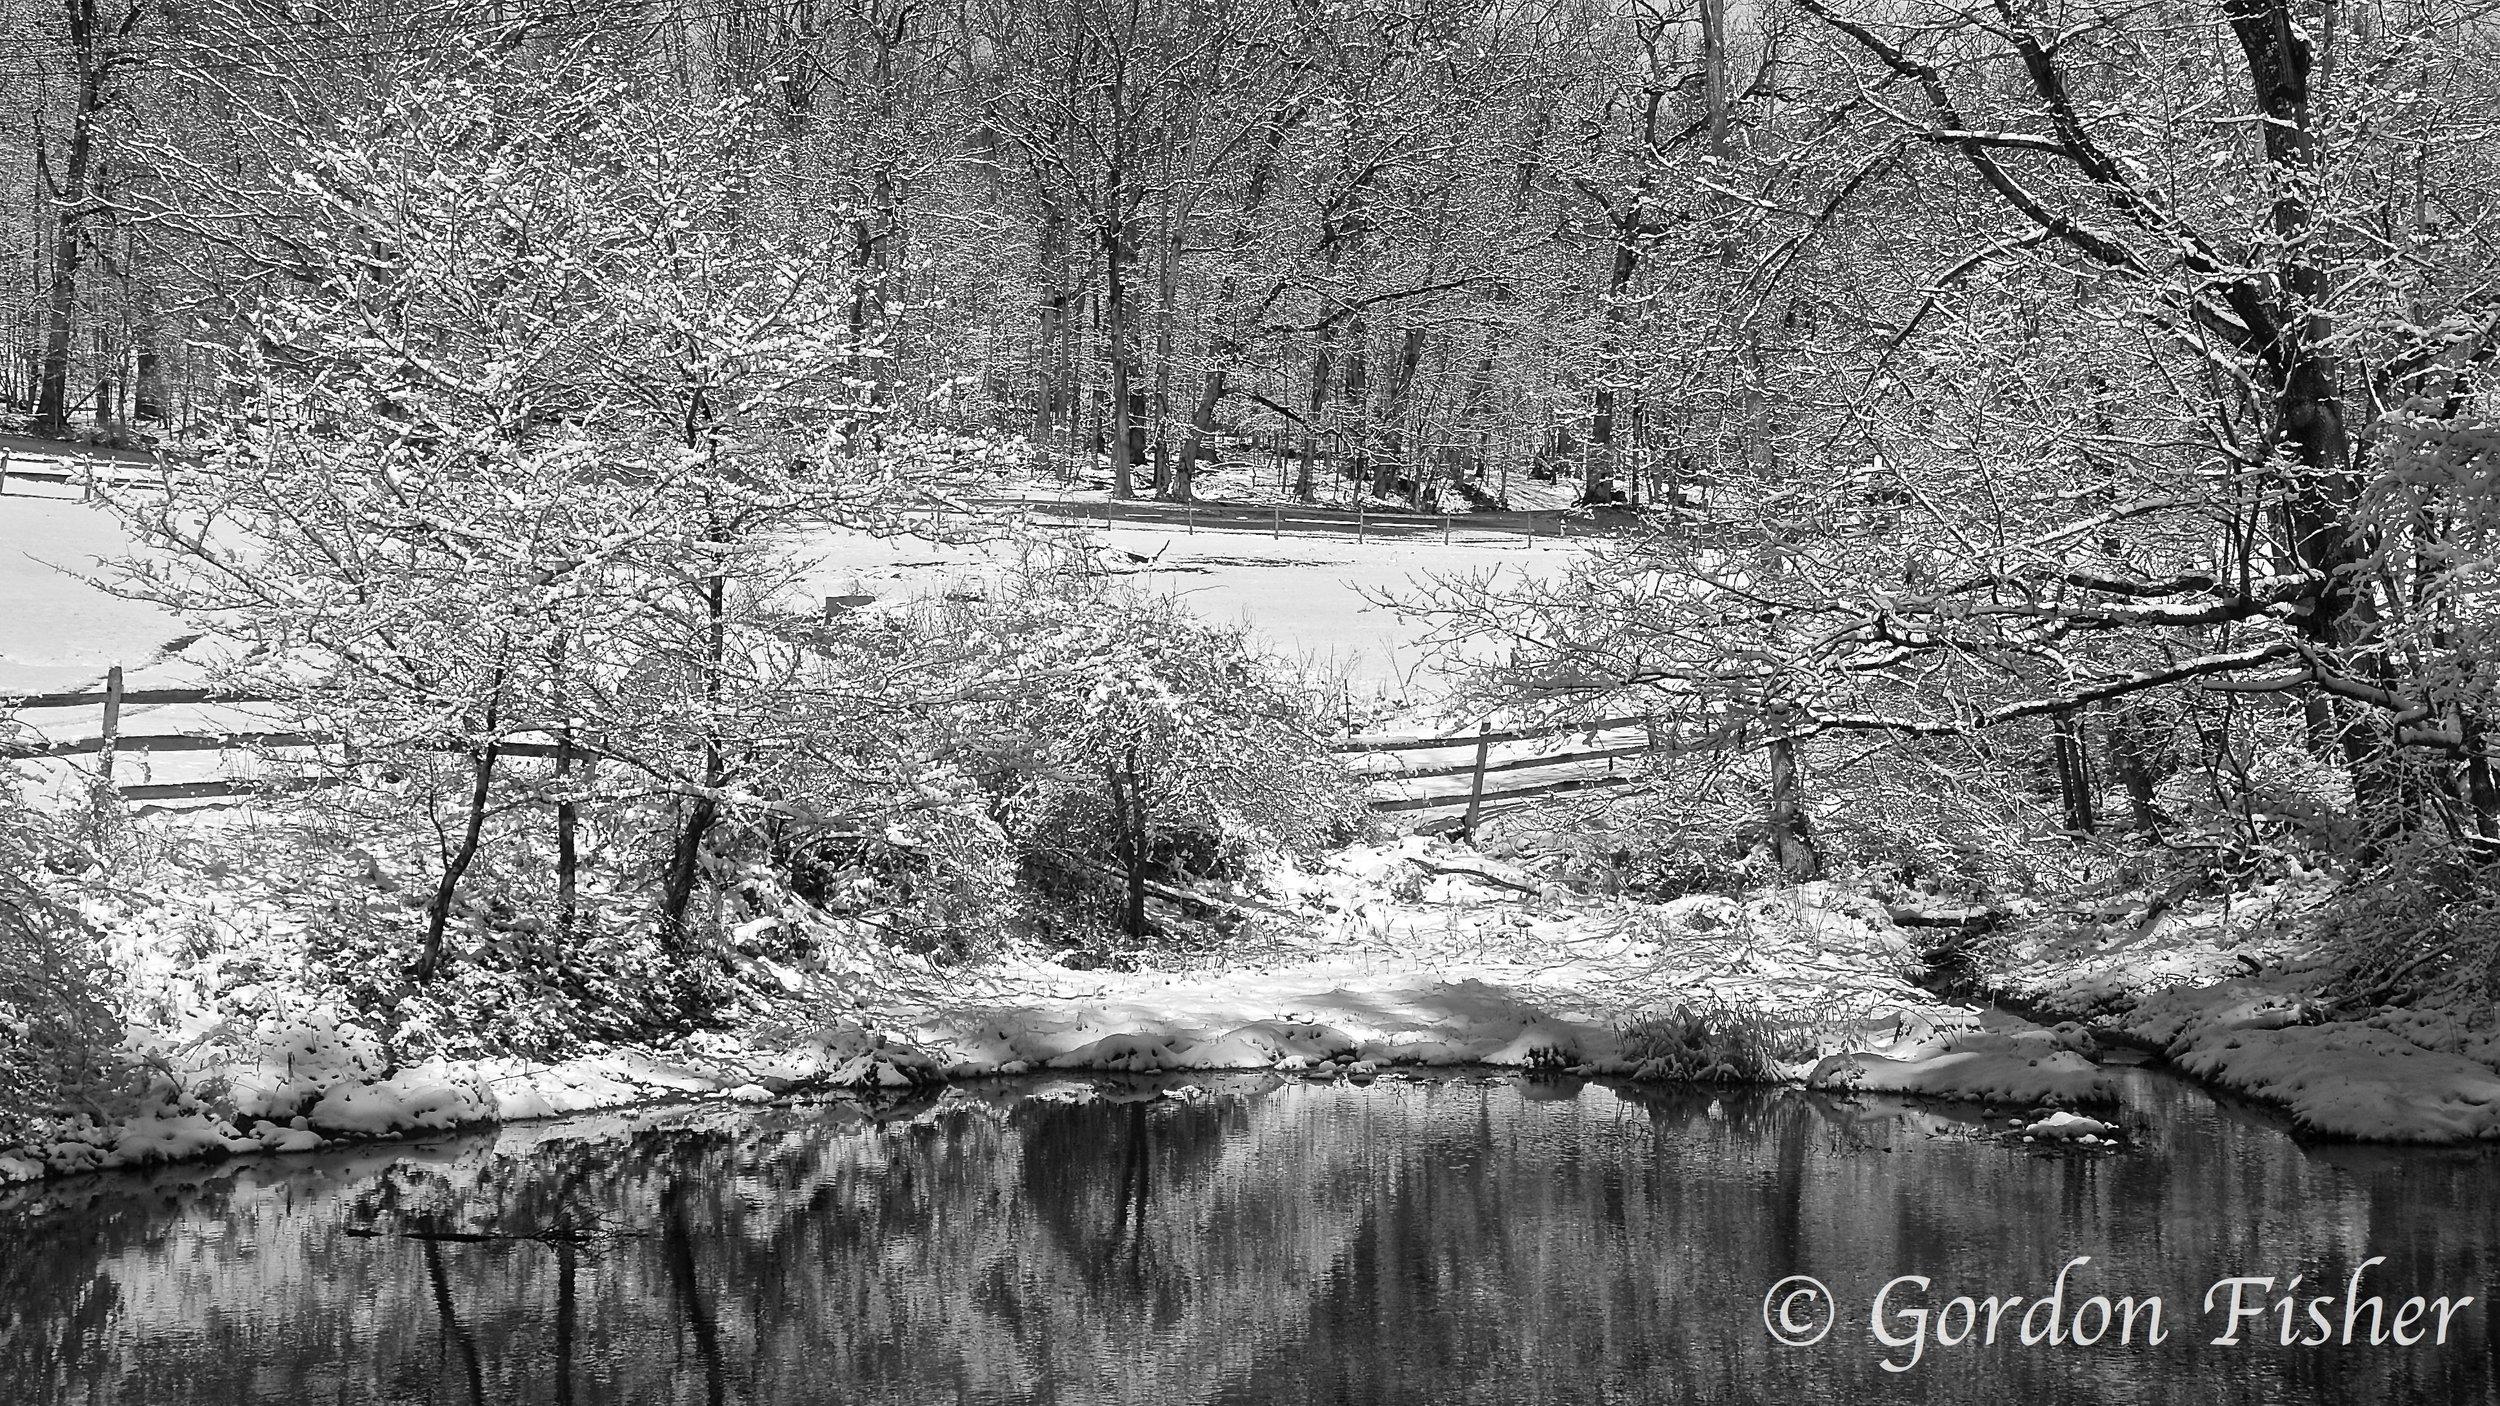 Early Spring Snowfall